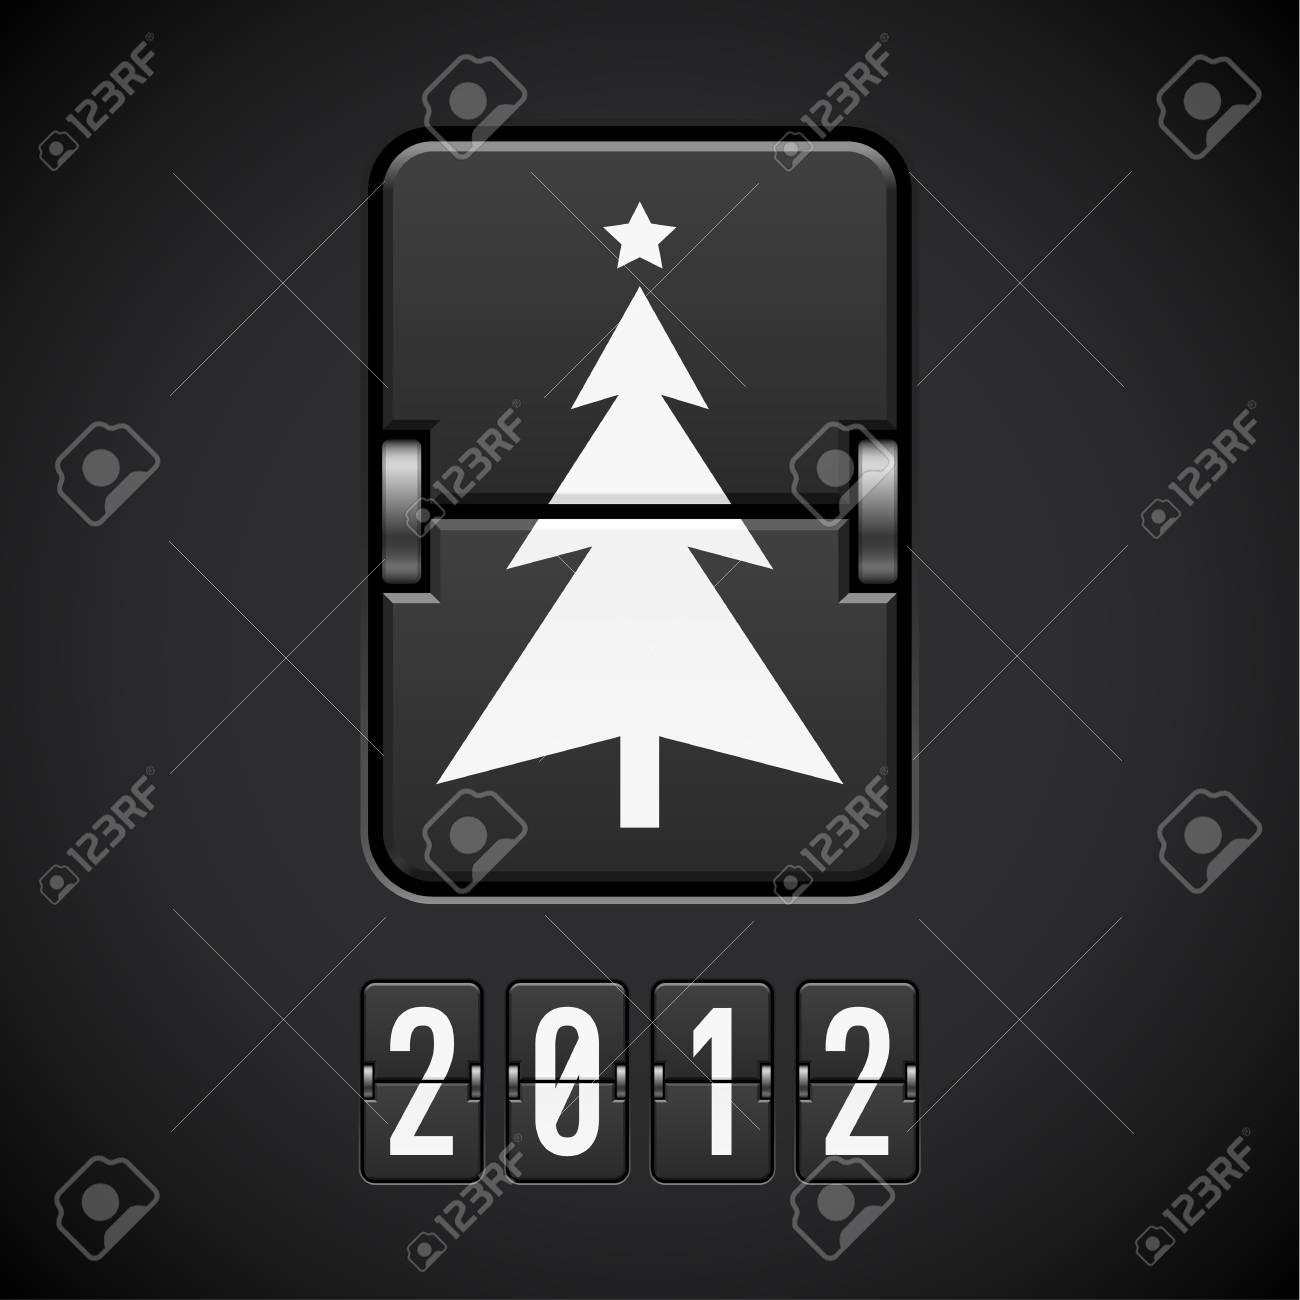 Scoreboard Christmas Tree. Illustration of the designer Stock Vector - 11351225